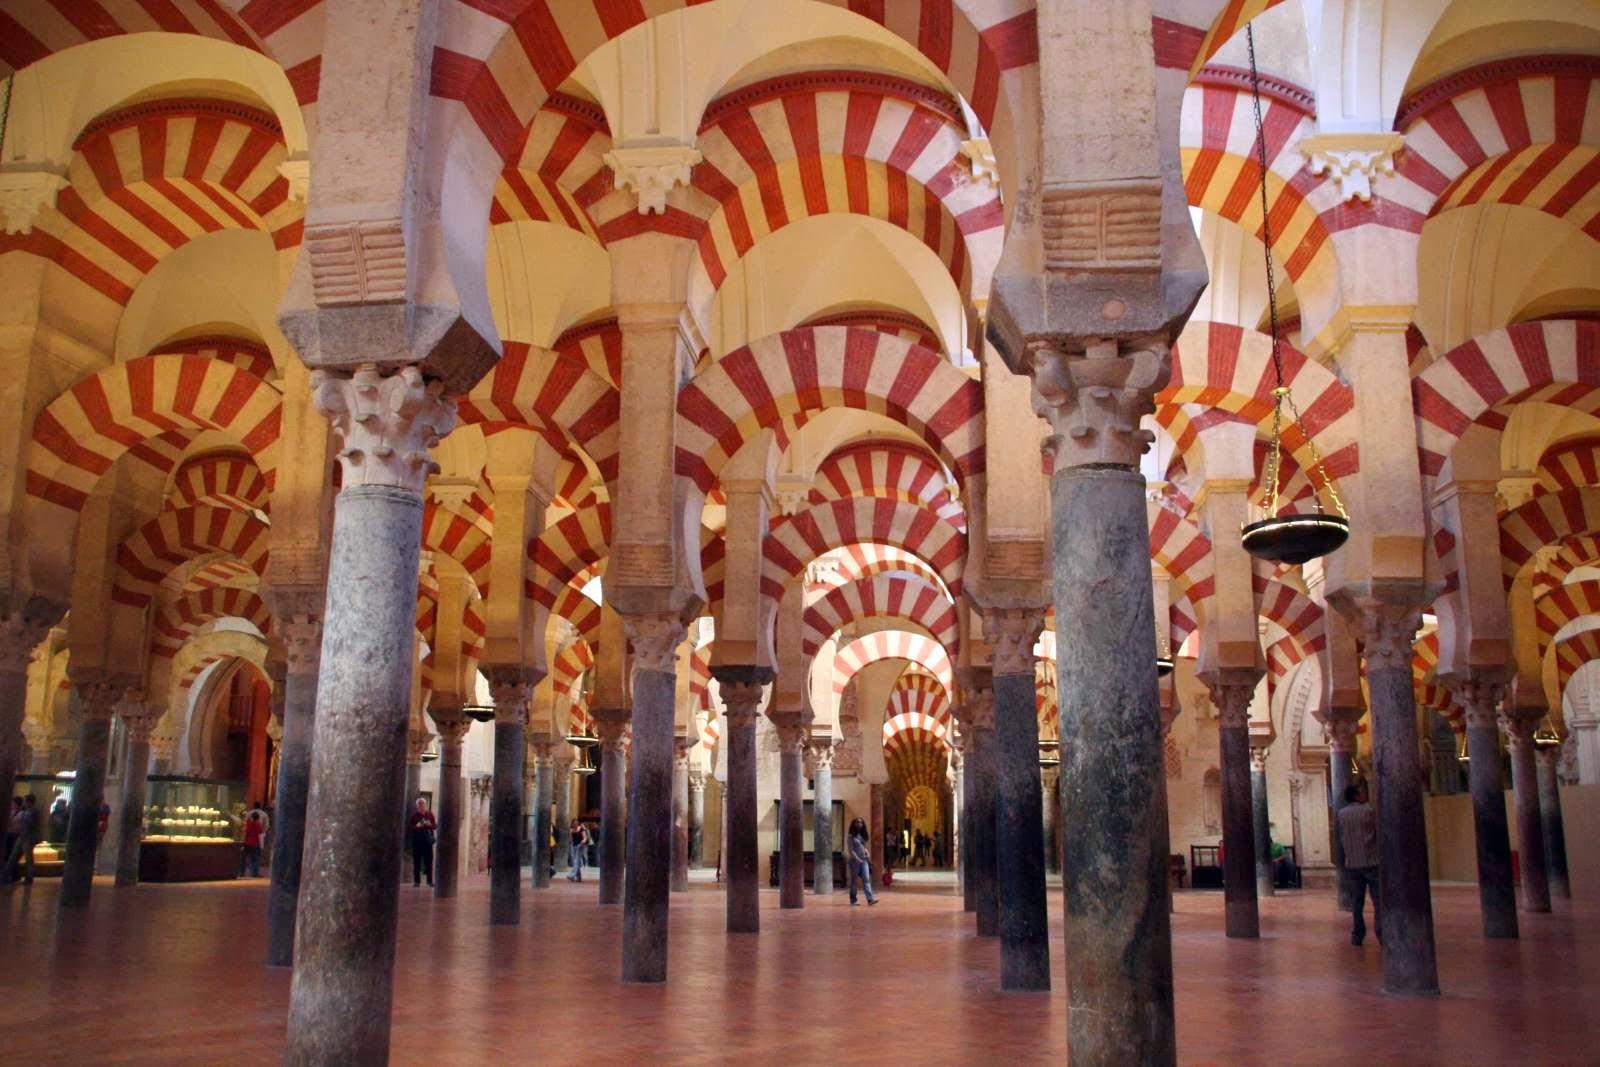 Que Es Una Mezquita Pinterest: Antrópicos: La Mezquita De Córdoba, Más Que Una Catedral